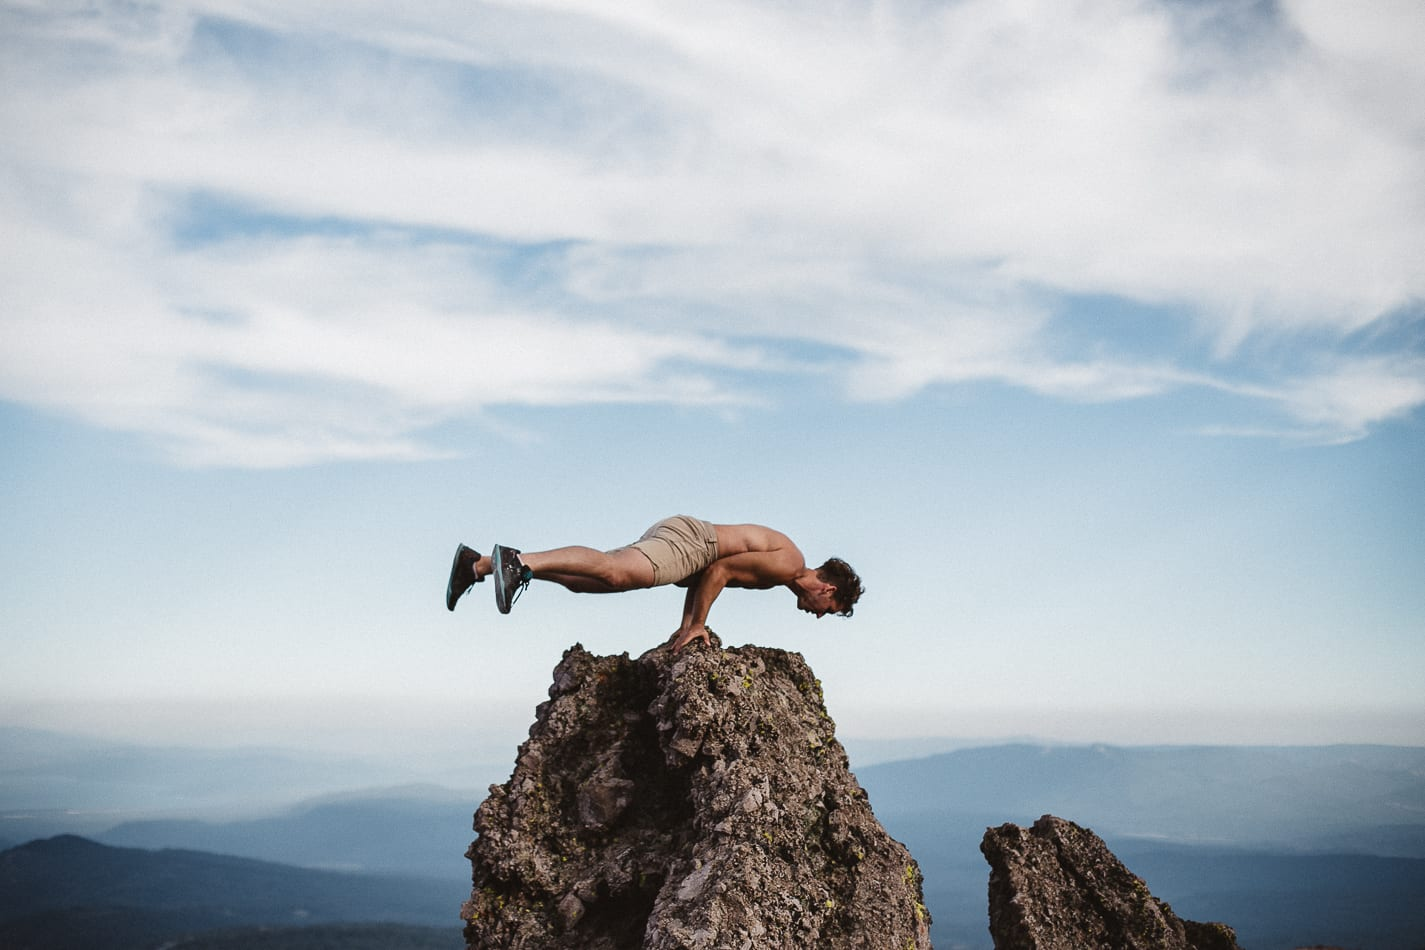 mount-lassen-california-adventure-lifestyle-photorapher-22